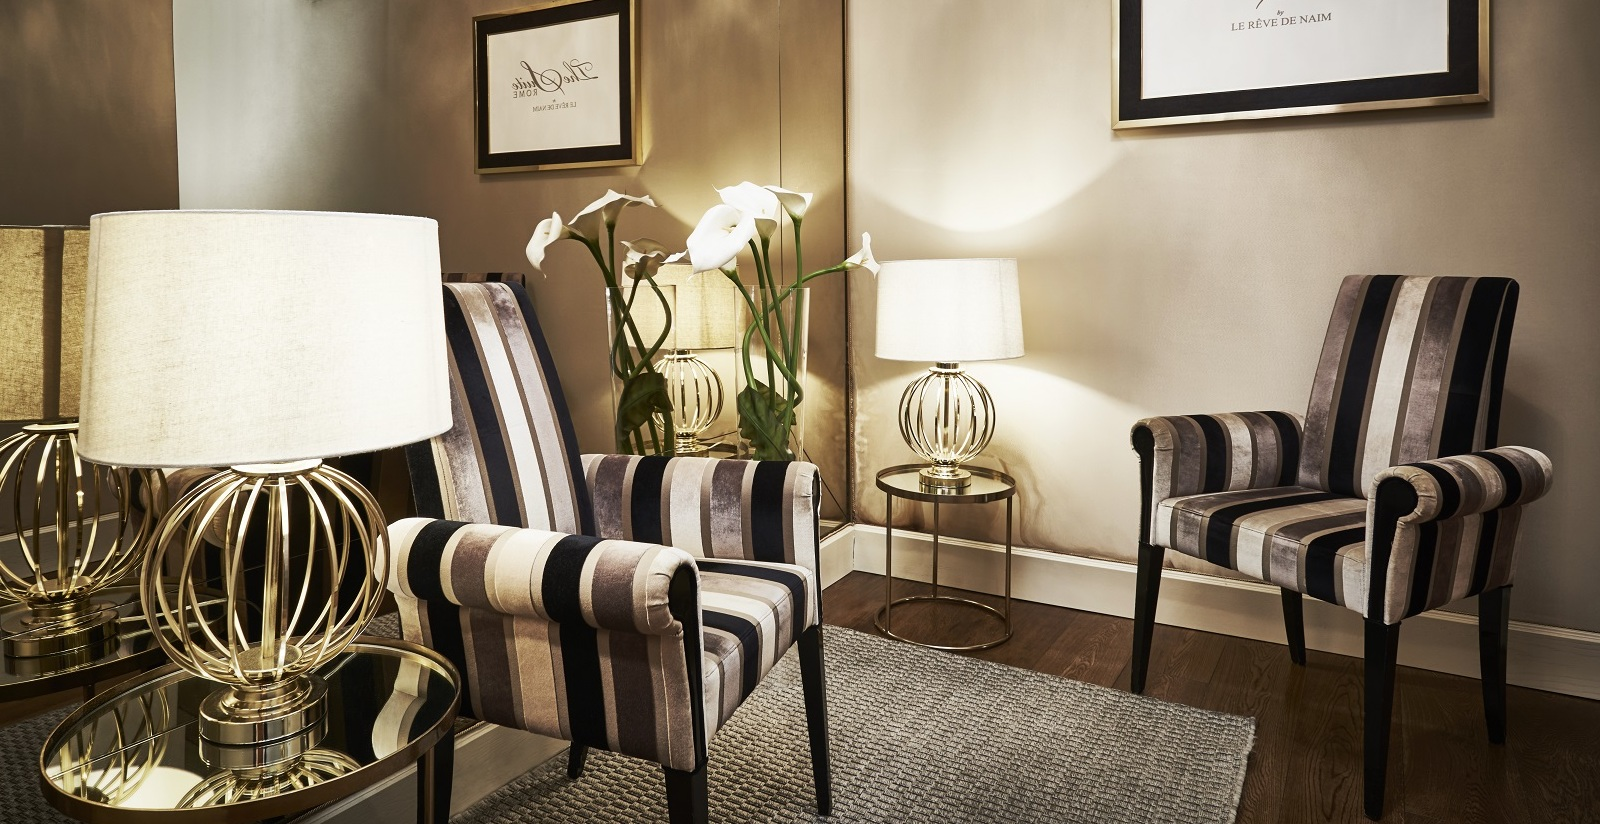 Surprising Choose The Royal Suite For The Maximum Comfort At Spagna Frankydiablos Diy Chair Ideas Frankydiabloscom